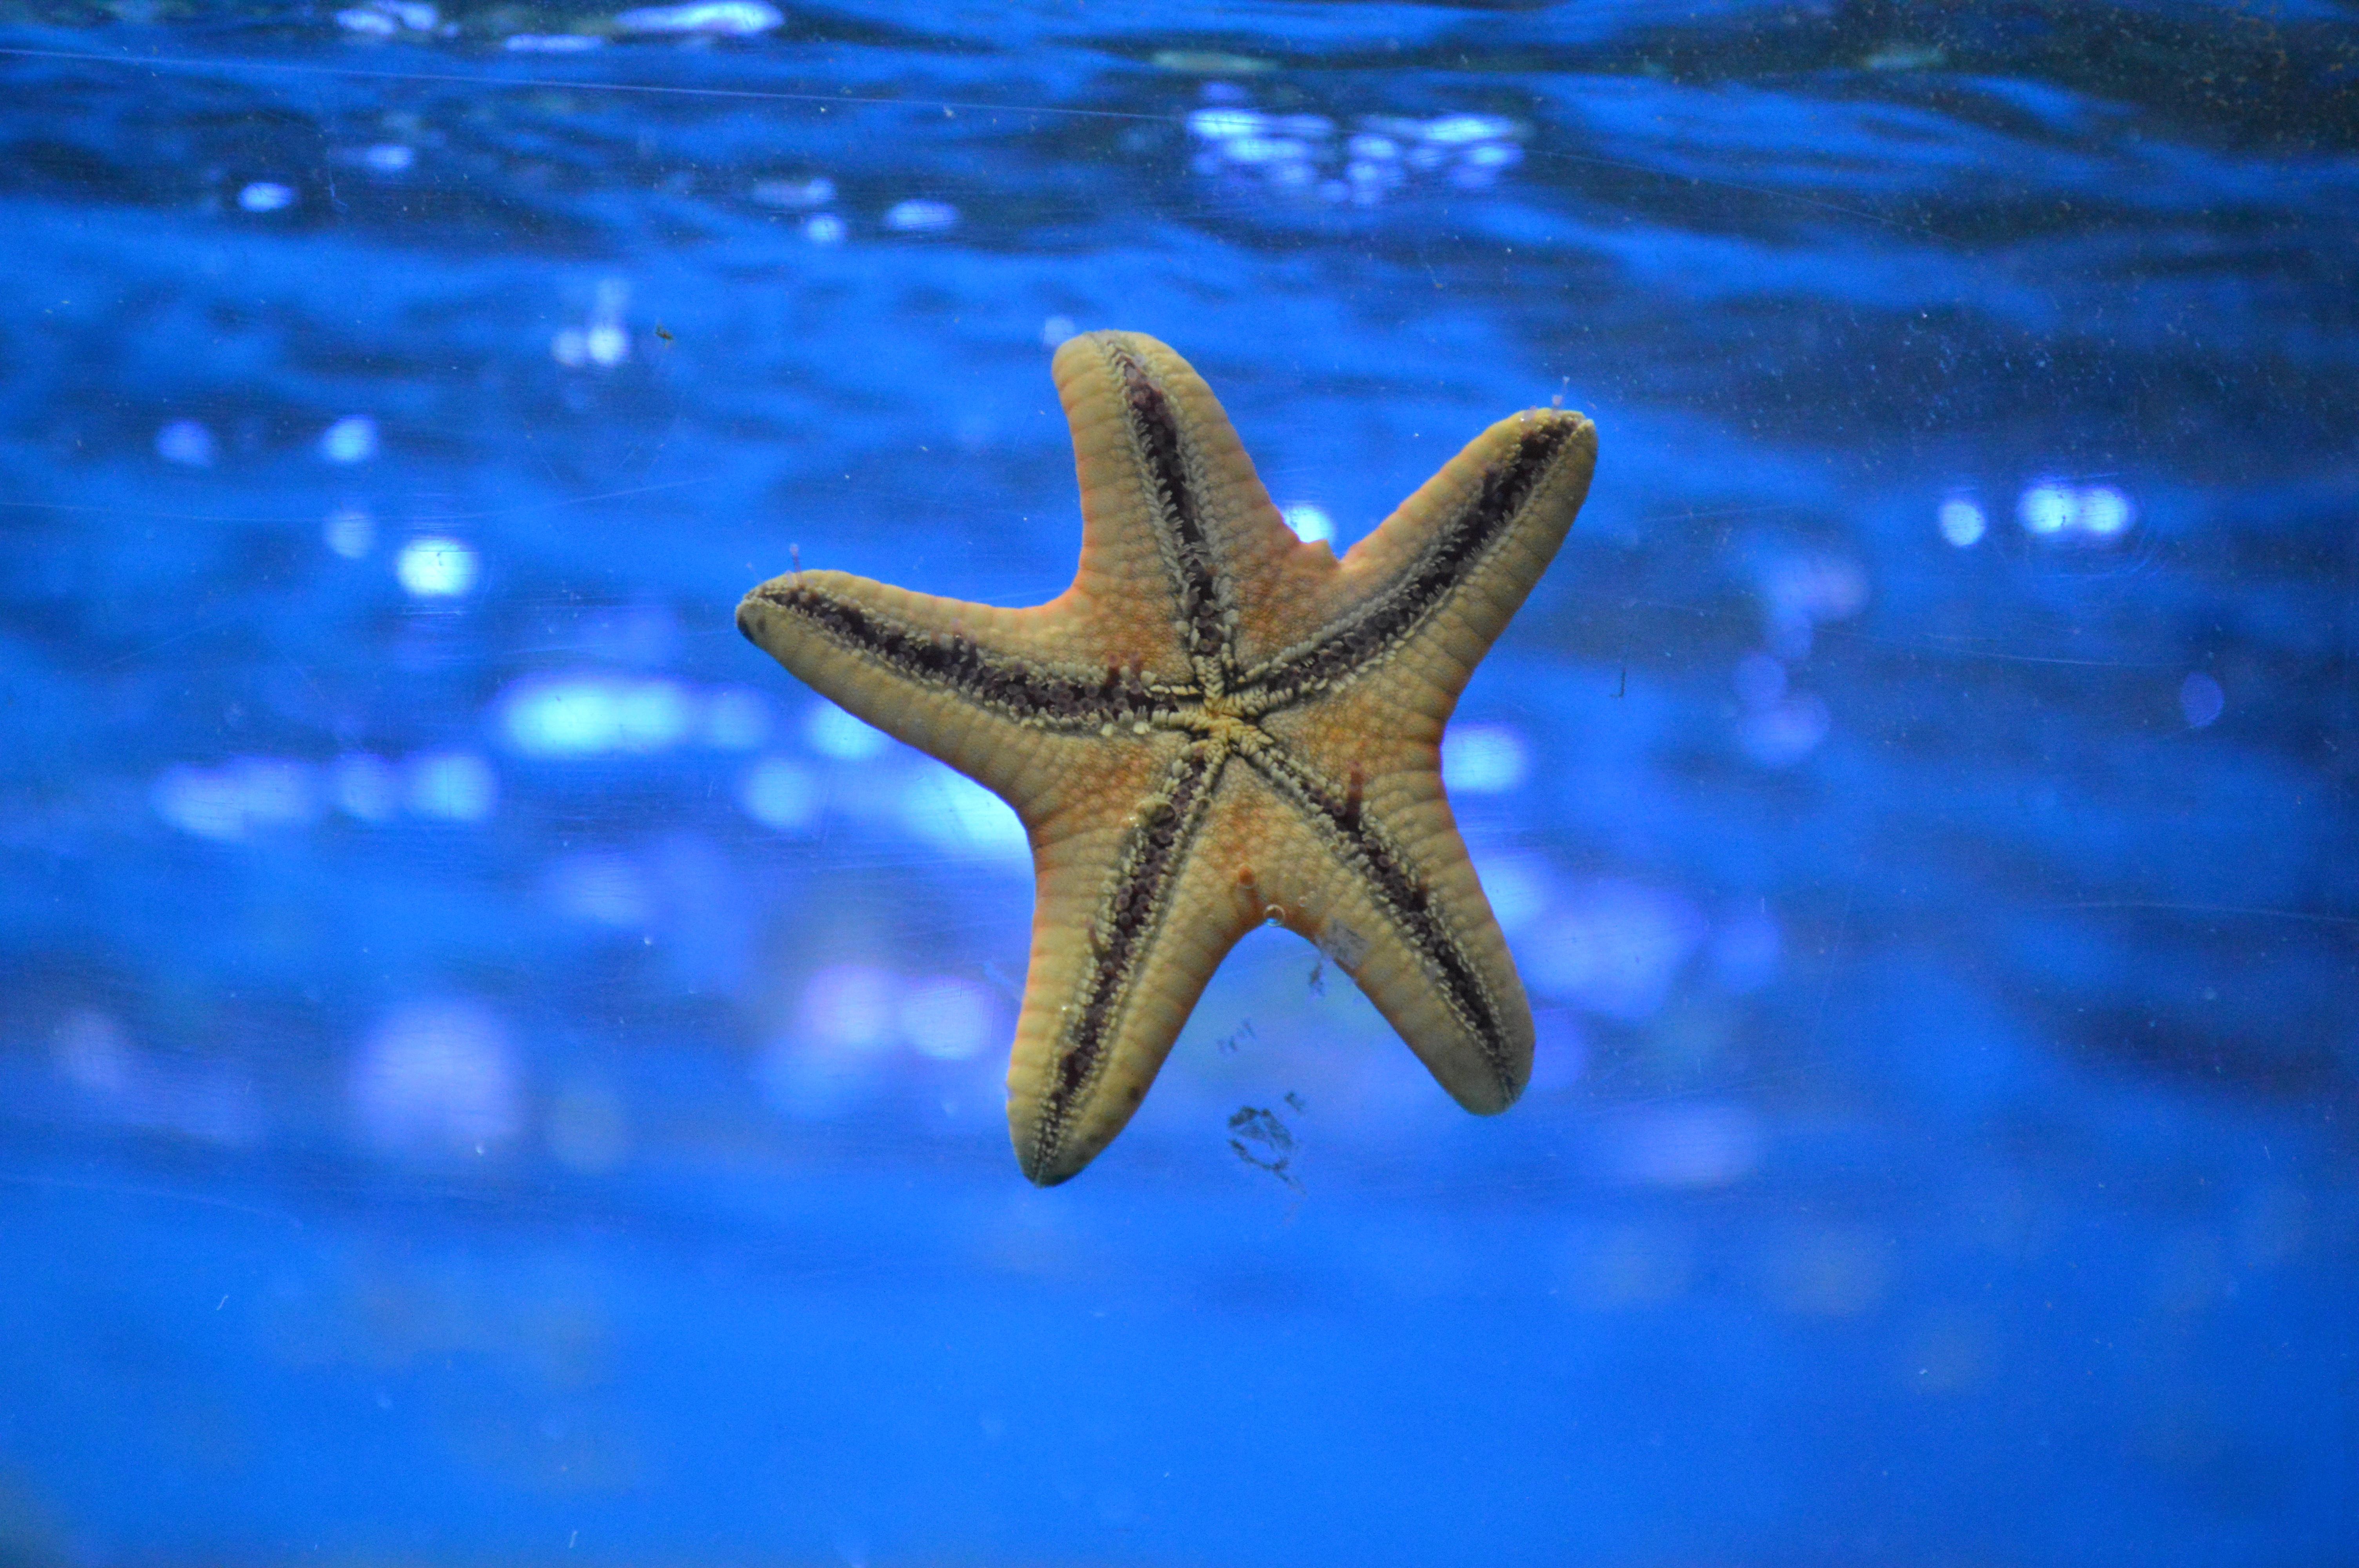 free images  water underwater blue starfish